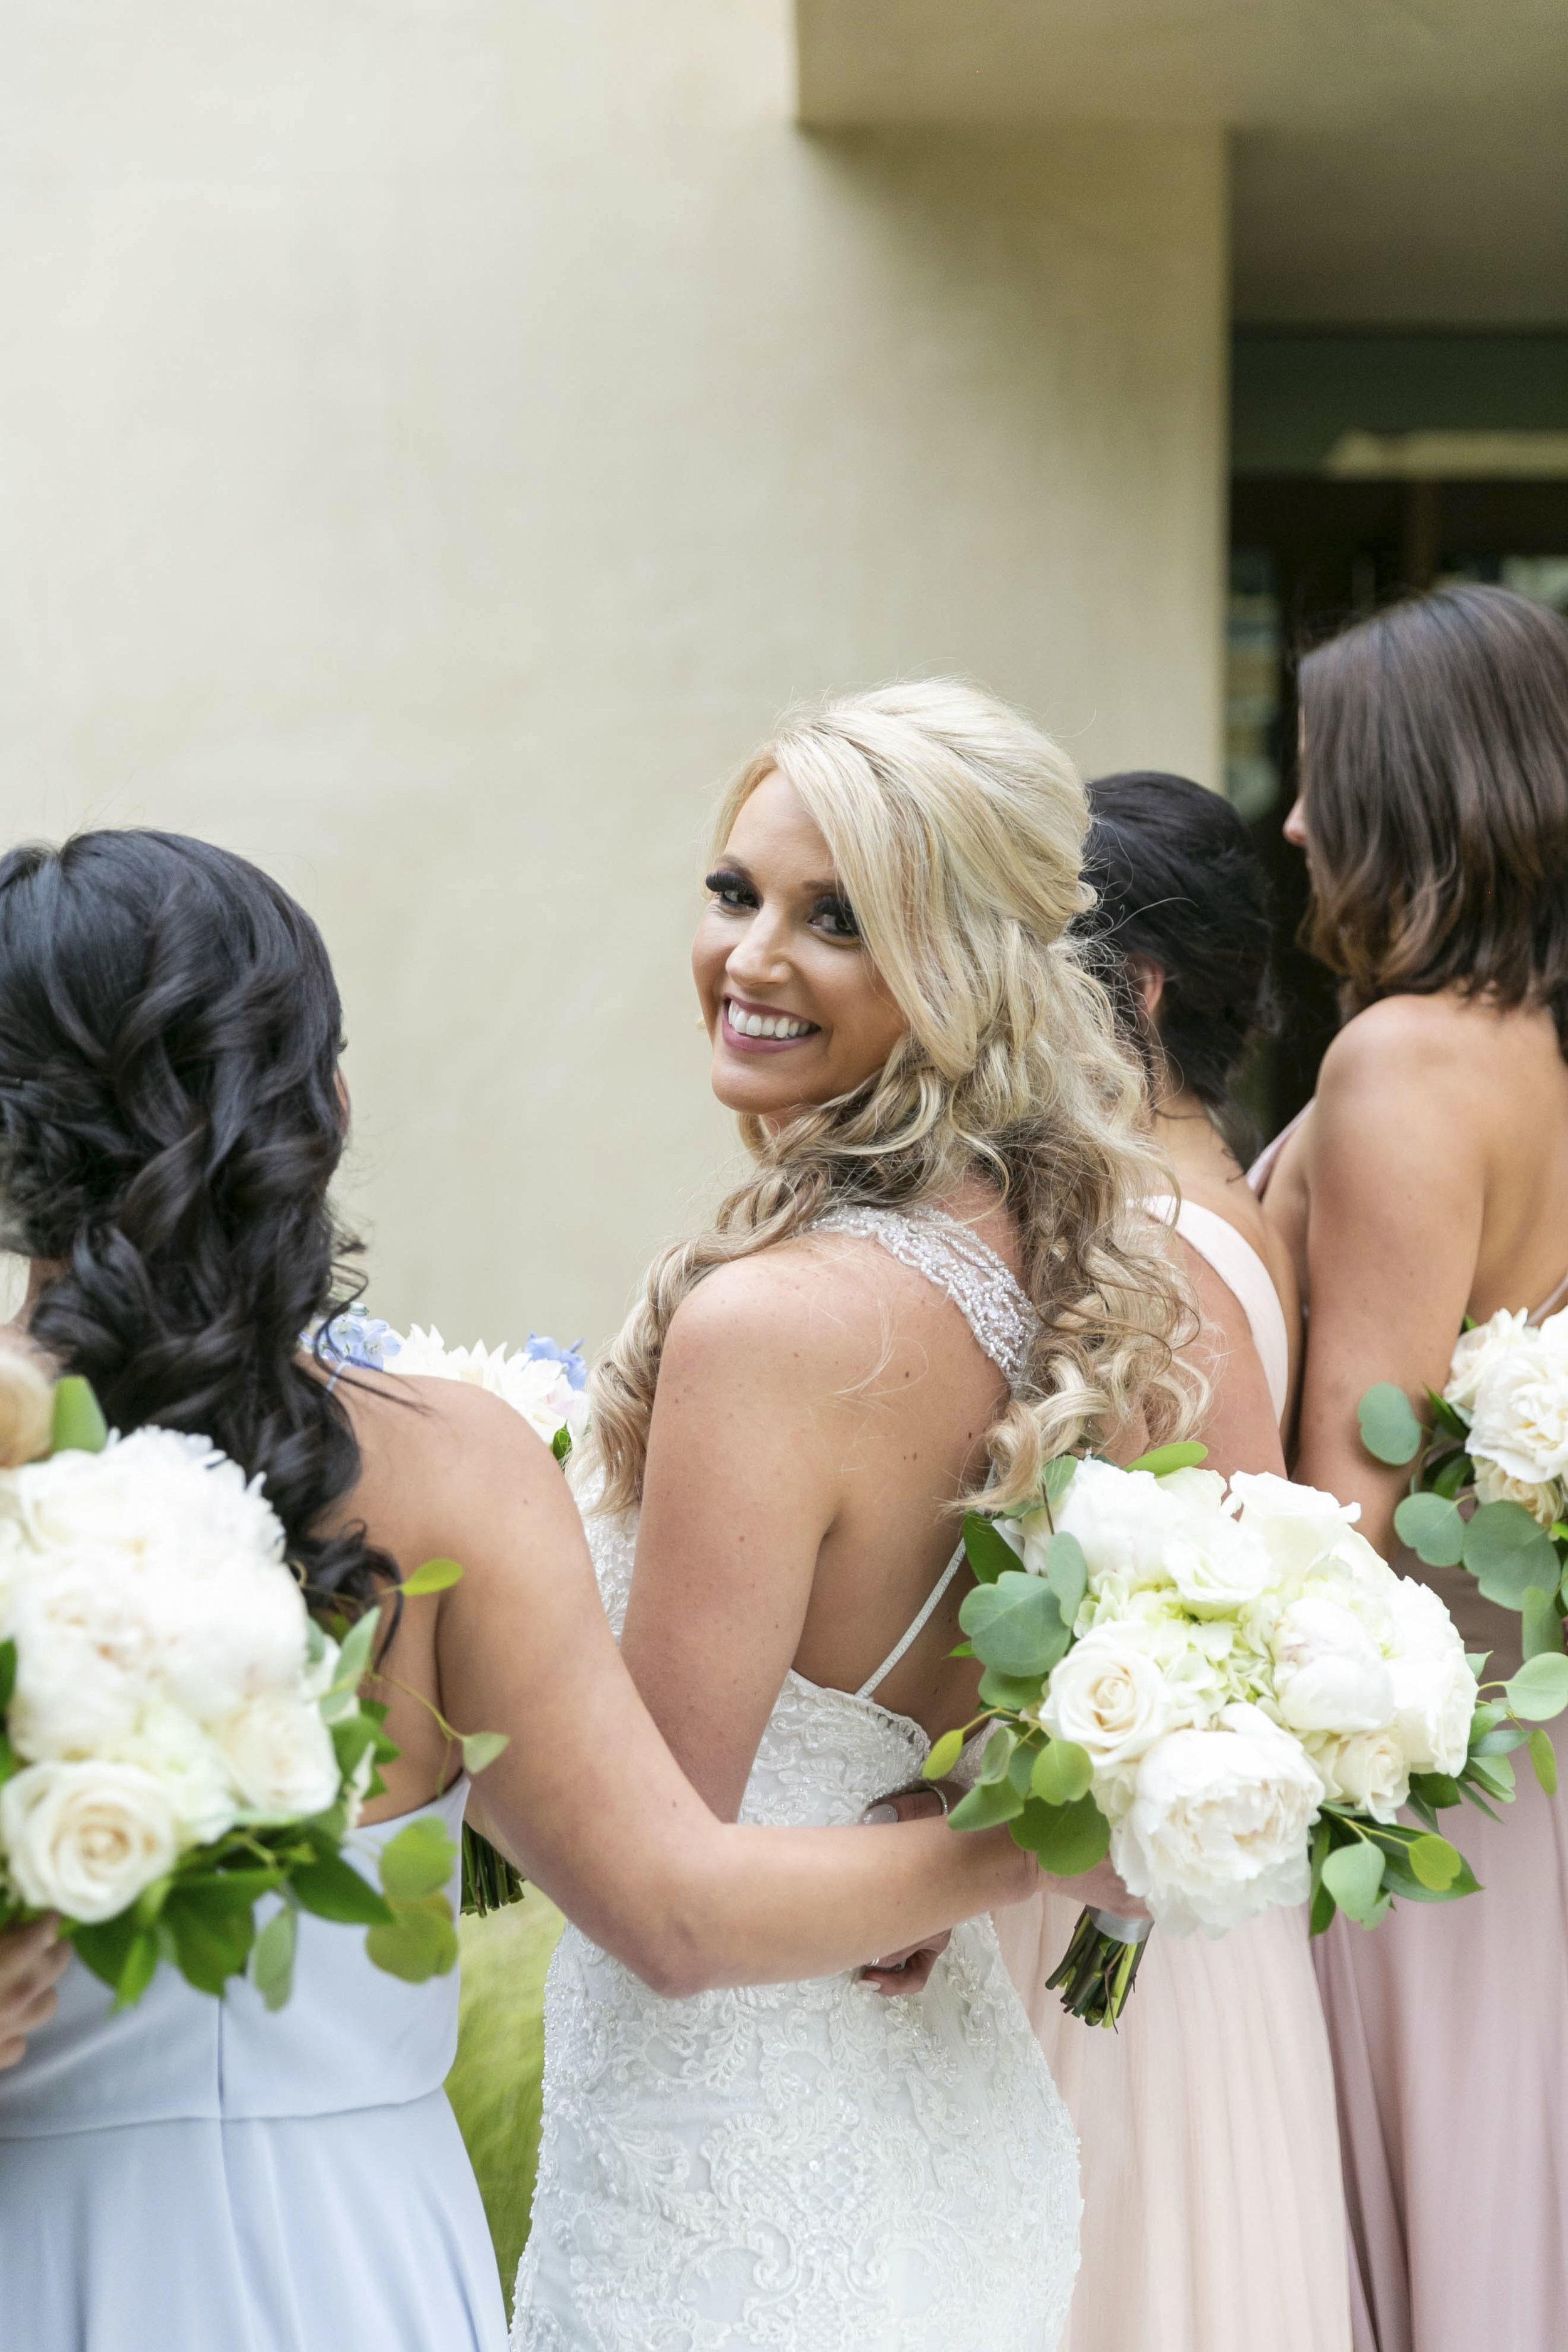 Domenica Beauty _ Hair and Makeup Artist _Wedding _ Temecula, CA Wedding _ Briana and Samuel _ 20.JPG